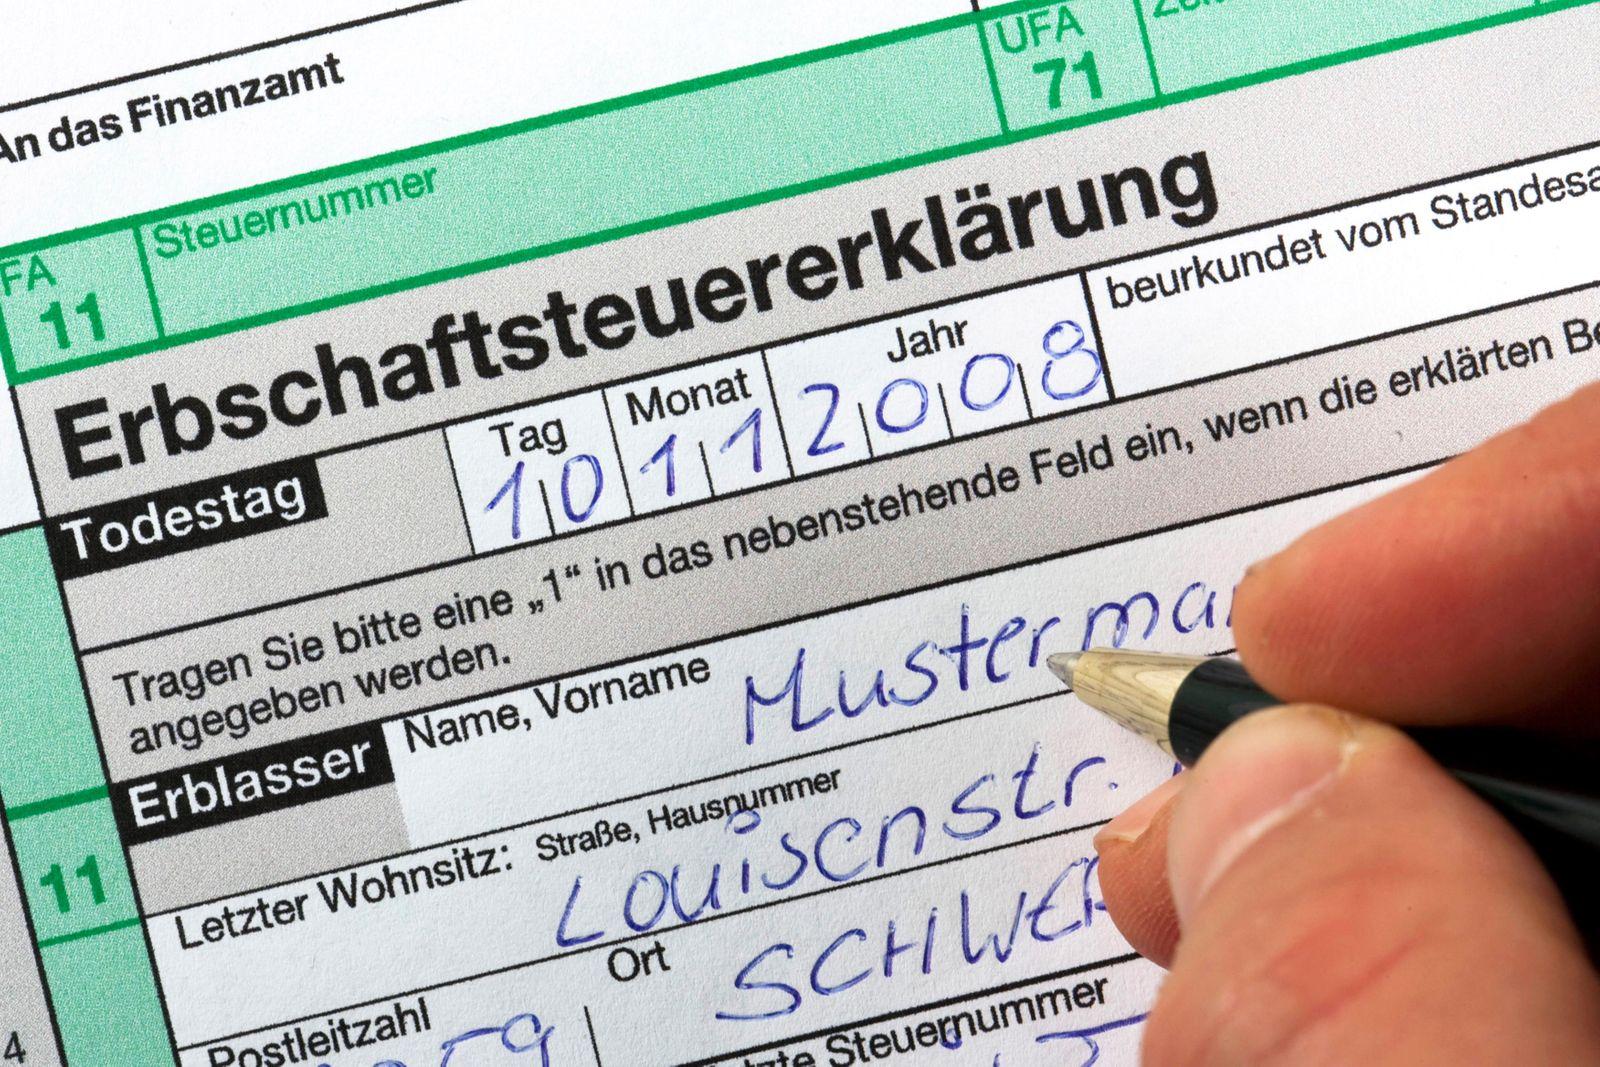 Erbschaftssteuer / Erbschaftssteuererklärung